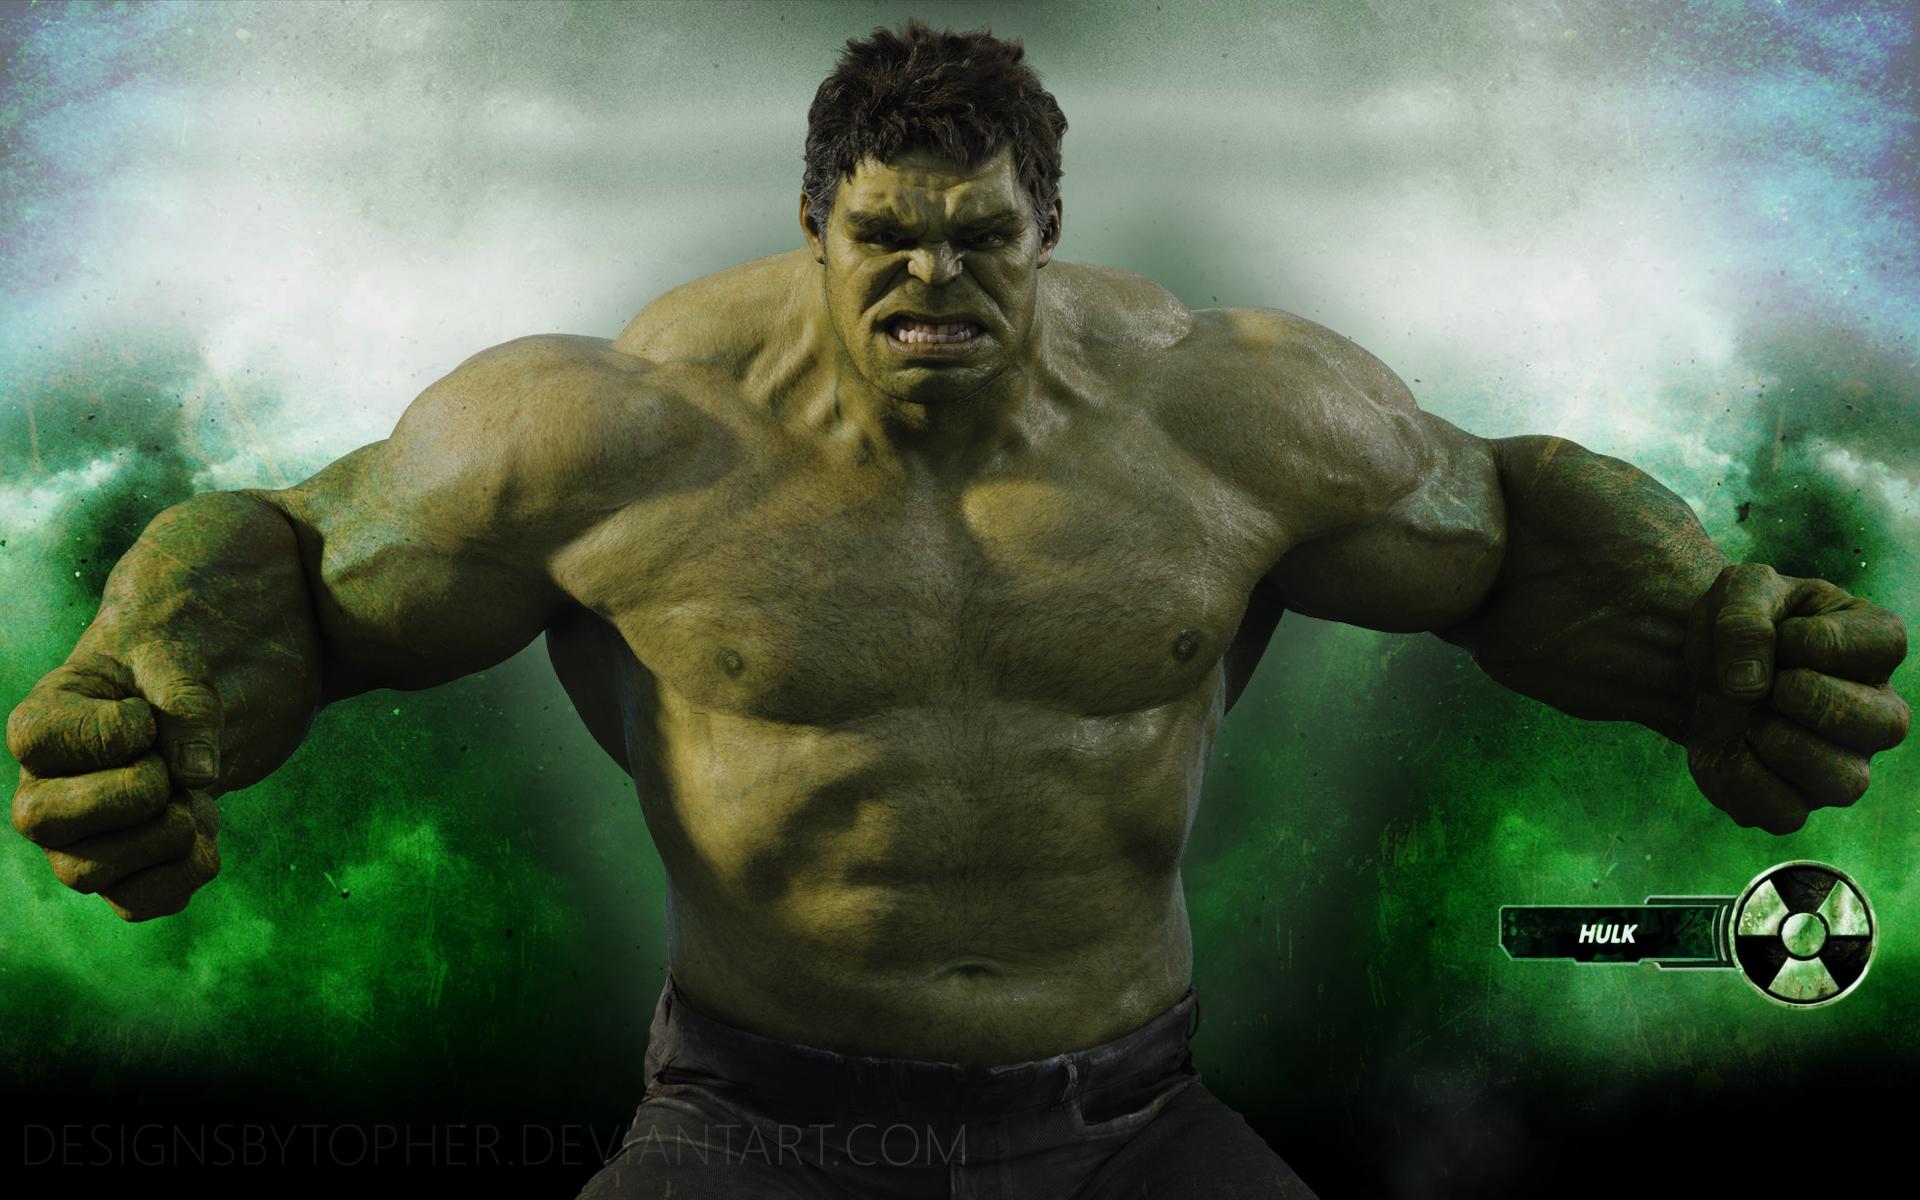 Hulk HD Wallpapers 1080p - WallpaperSafari  Avengers Wallpaper Hd Hulk